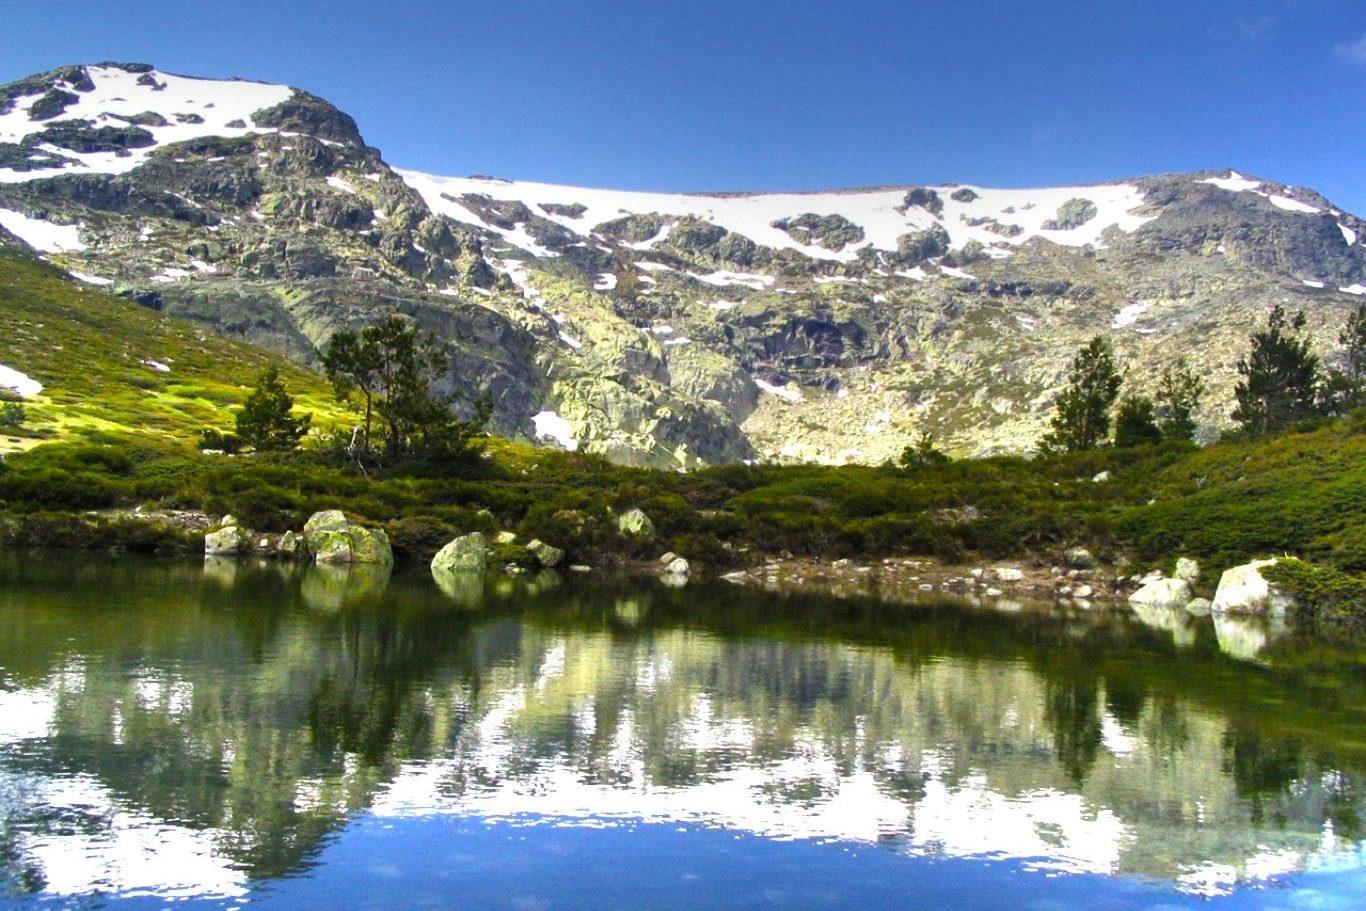 Parque Cumbre Natural Parks Project e1587805169237 - La Cumbre, Circo y Lagunas de Peñalara-Madrid-Spain